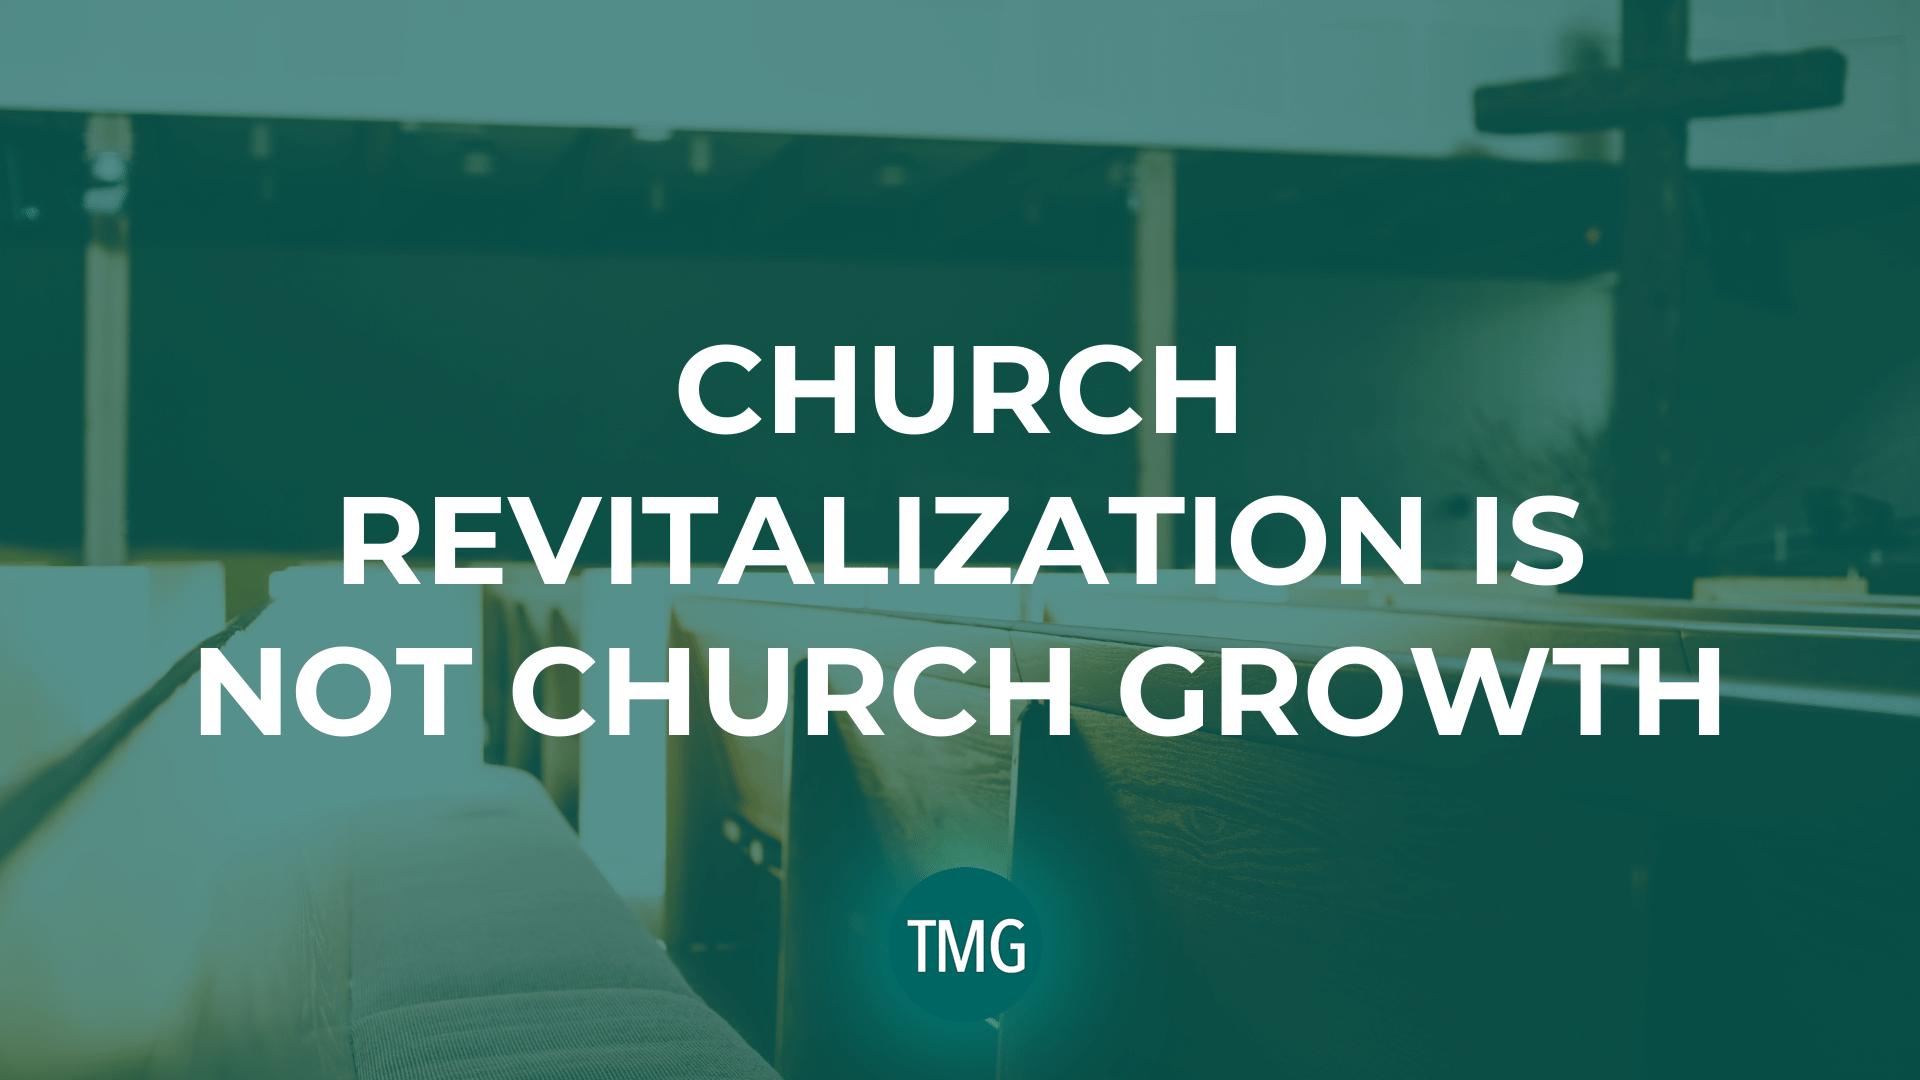 church-revitalization-is-not-church-growth-header-image